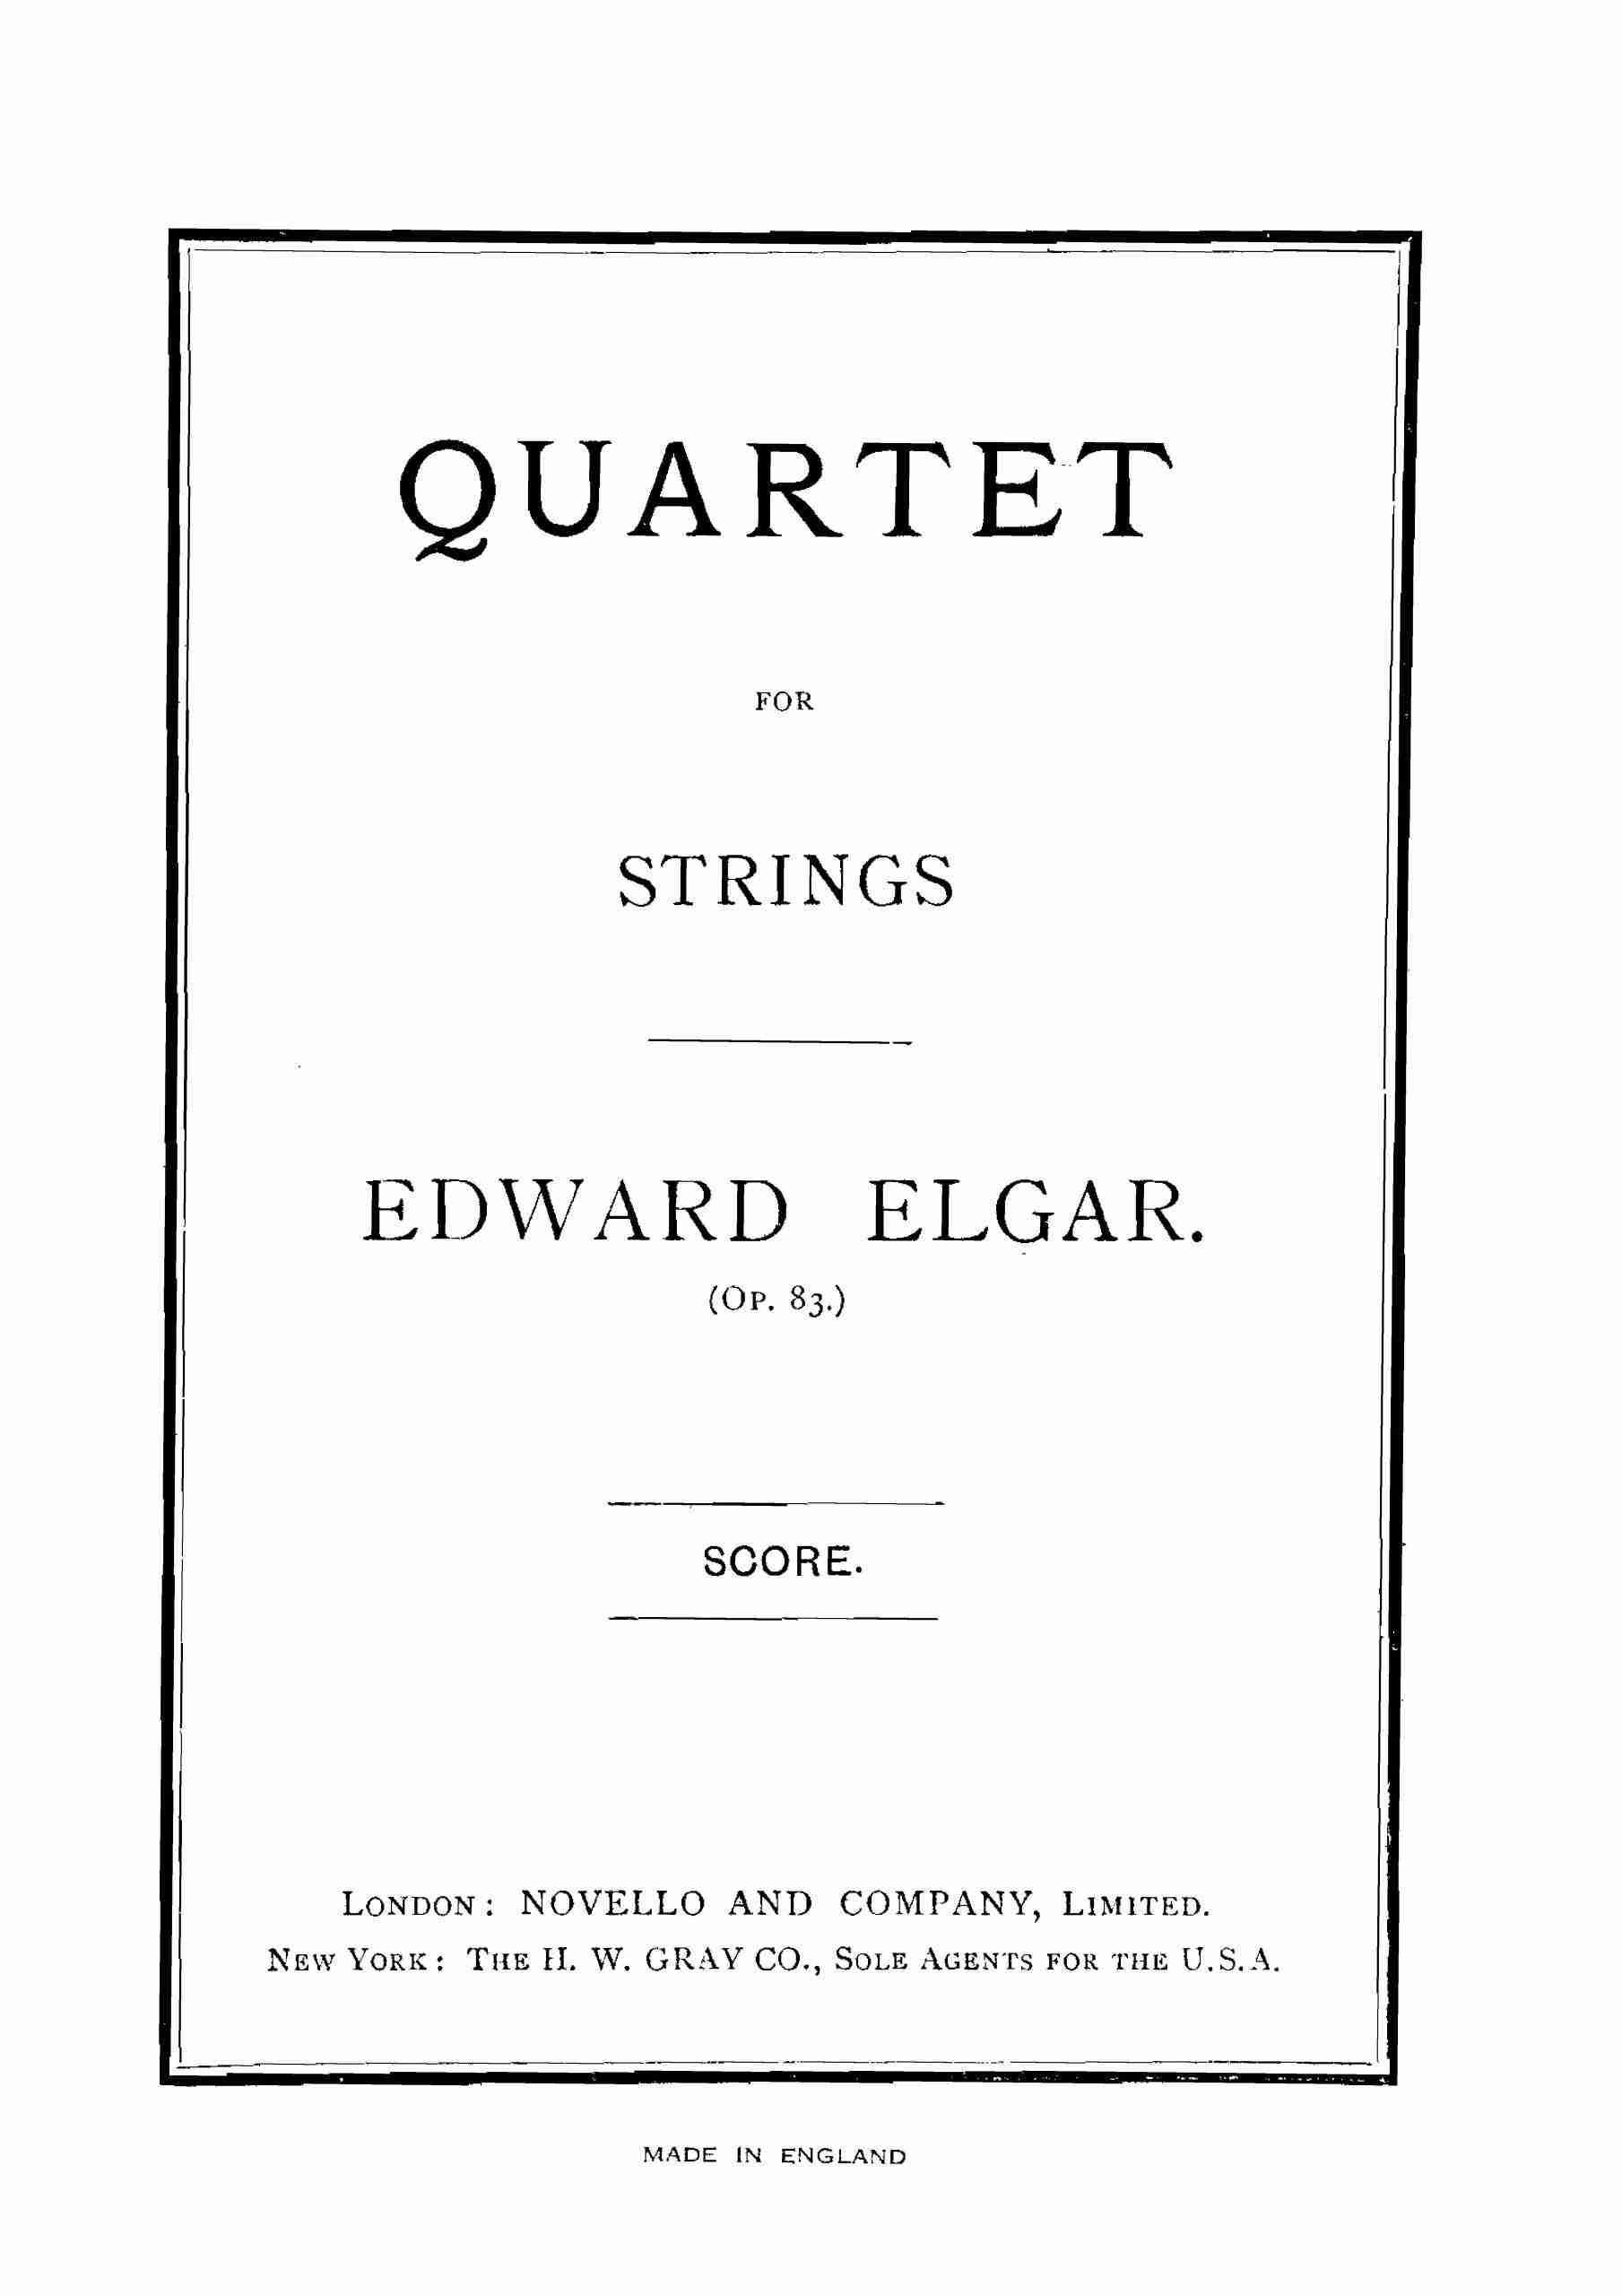 Elgar - String Quartet, Op.83 - Score